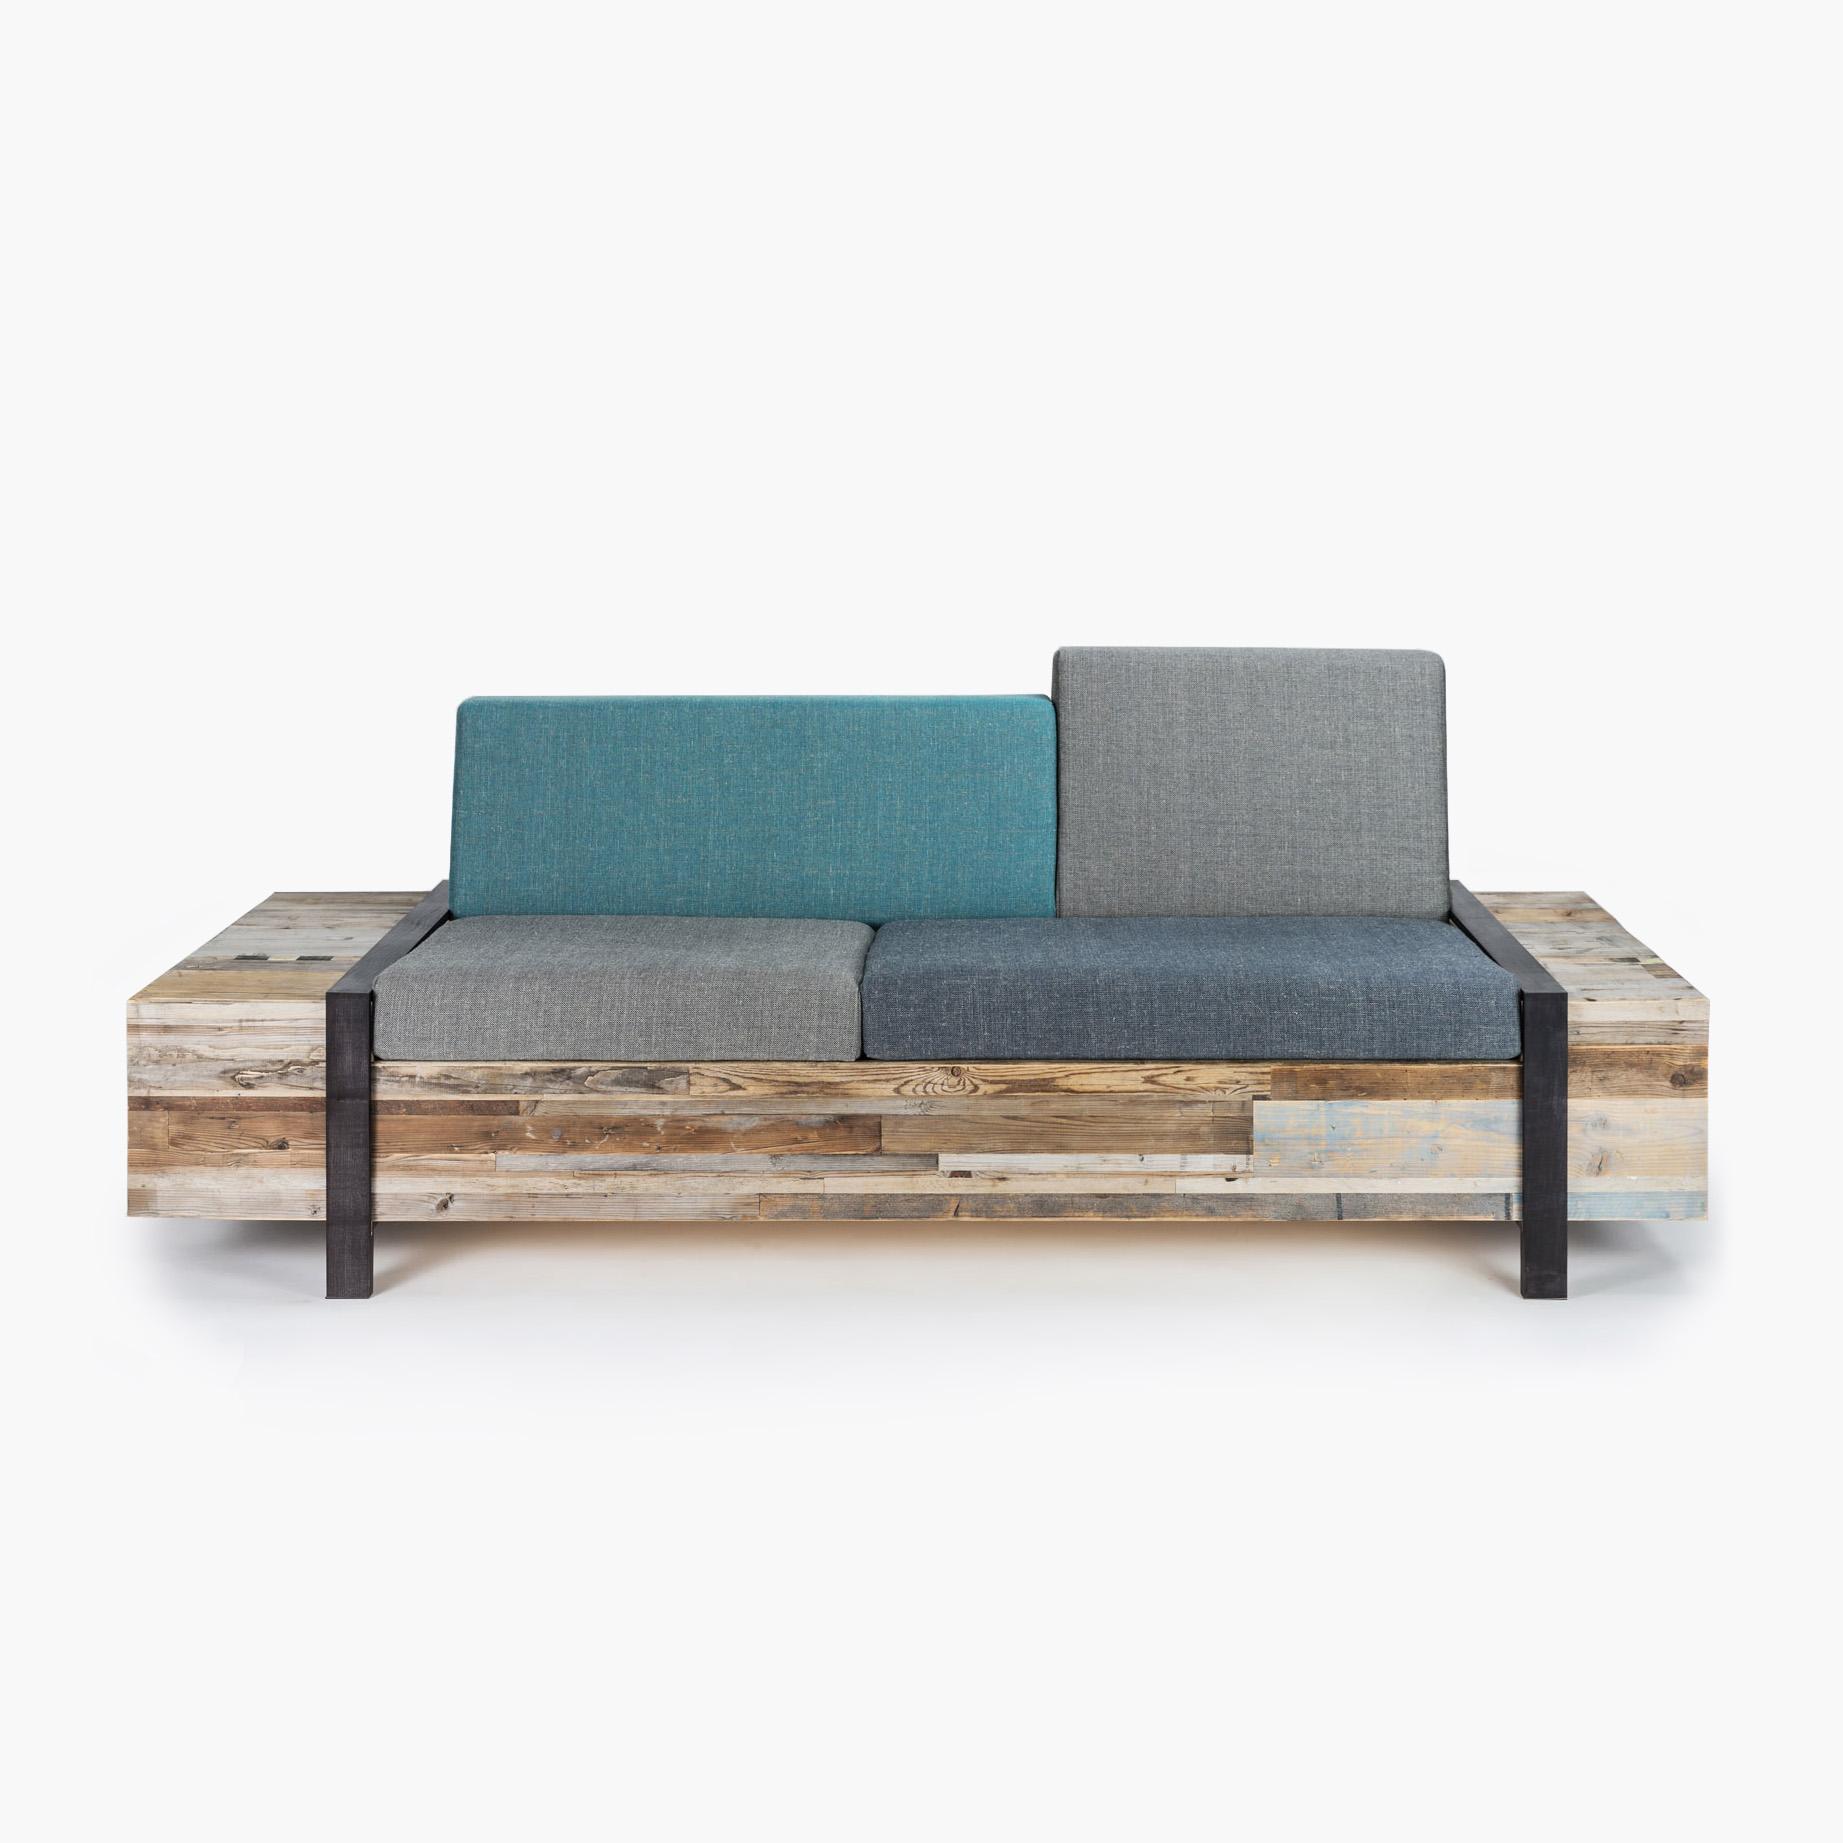 Pleasant Couch Patchwork 220 Ibusinesslaw Wood Chair Design Ideas Ibusinesslaworg